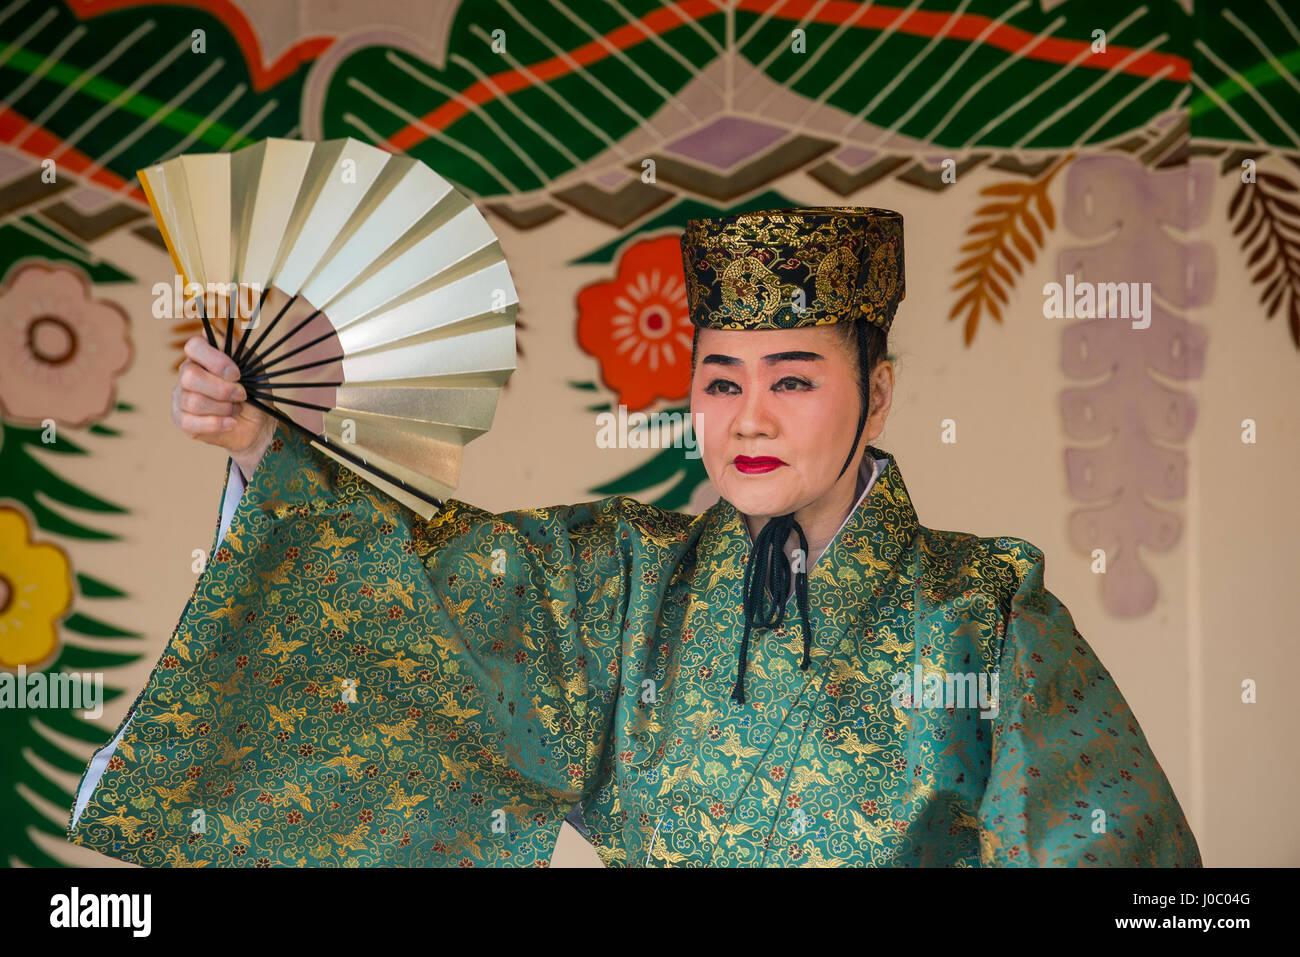 Traditional dressed dancer, Shuri Castle, UNESCO World Heritage Site, Naha, Okinawa, Japan, Asia - Stock Image